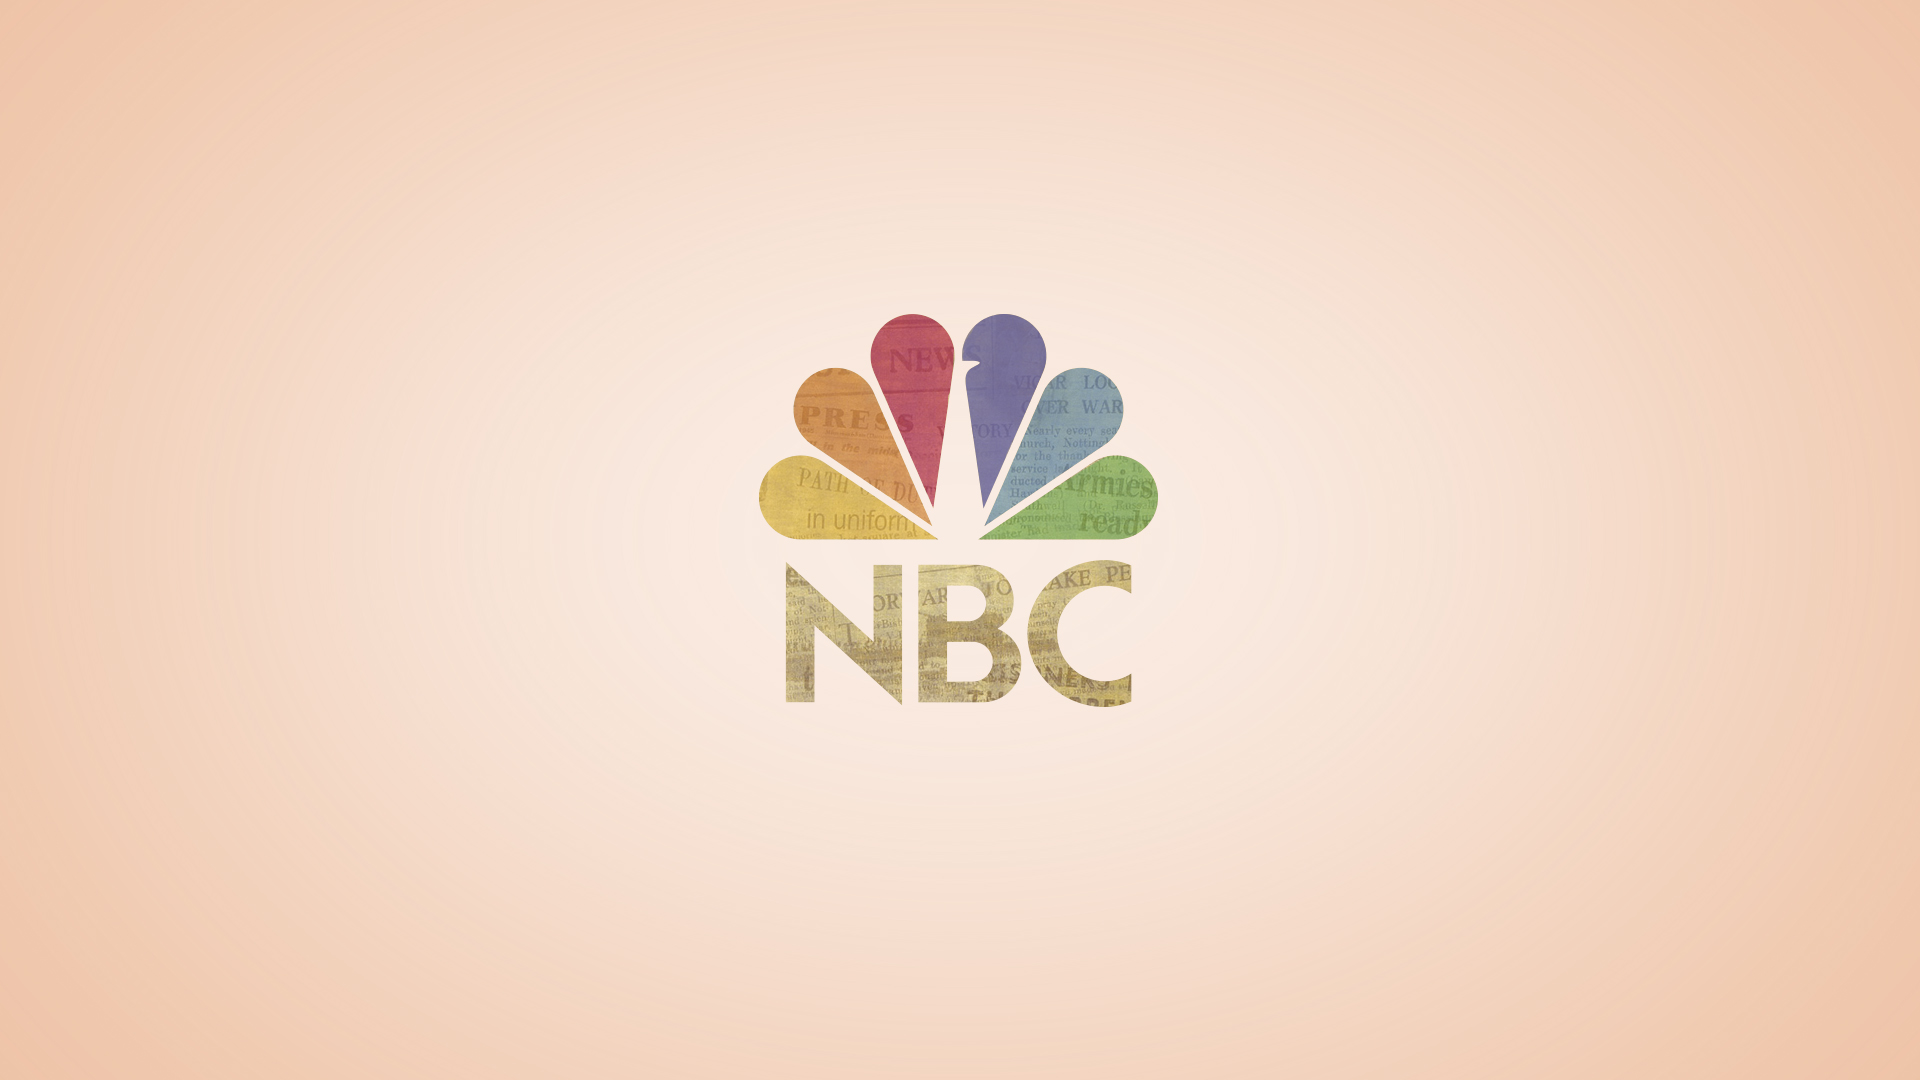 NBC_LOGO3.jpg